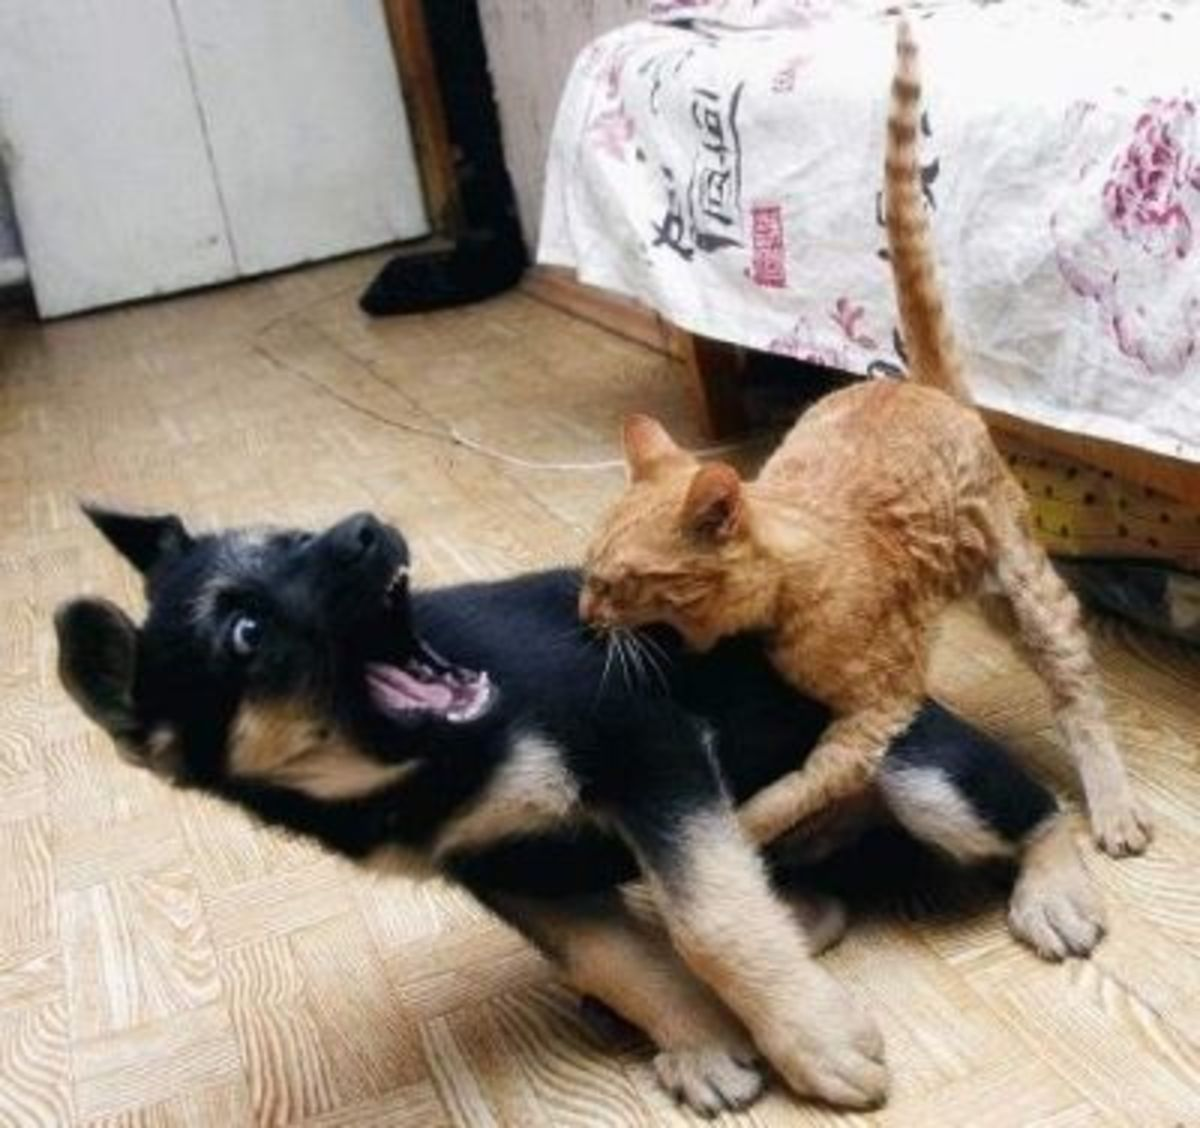 October 18th - Scaredy Cat